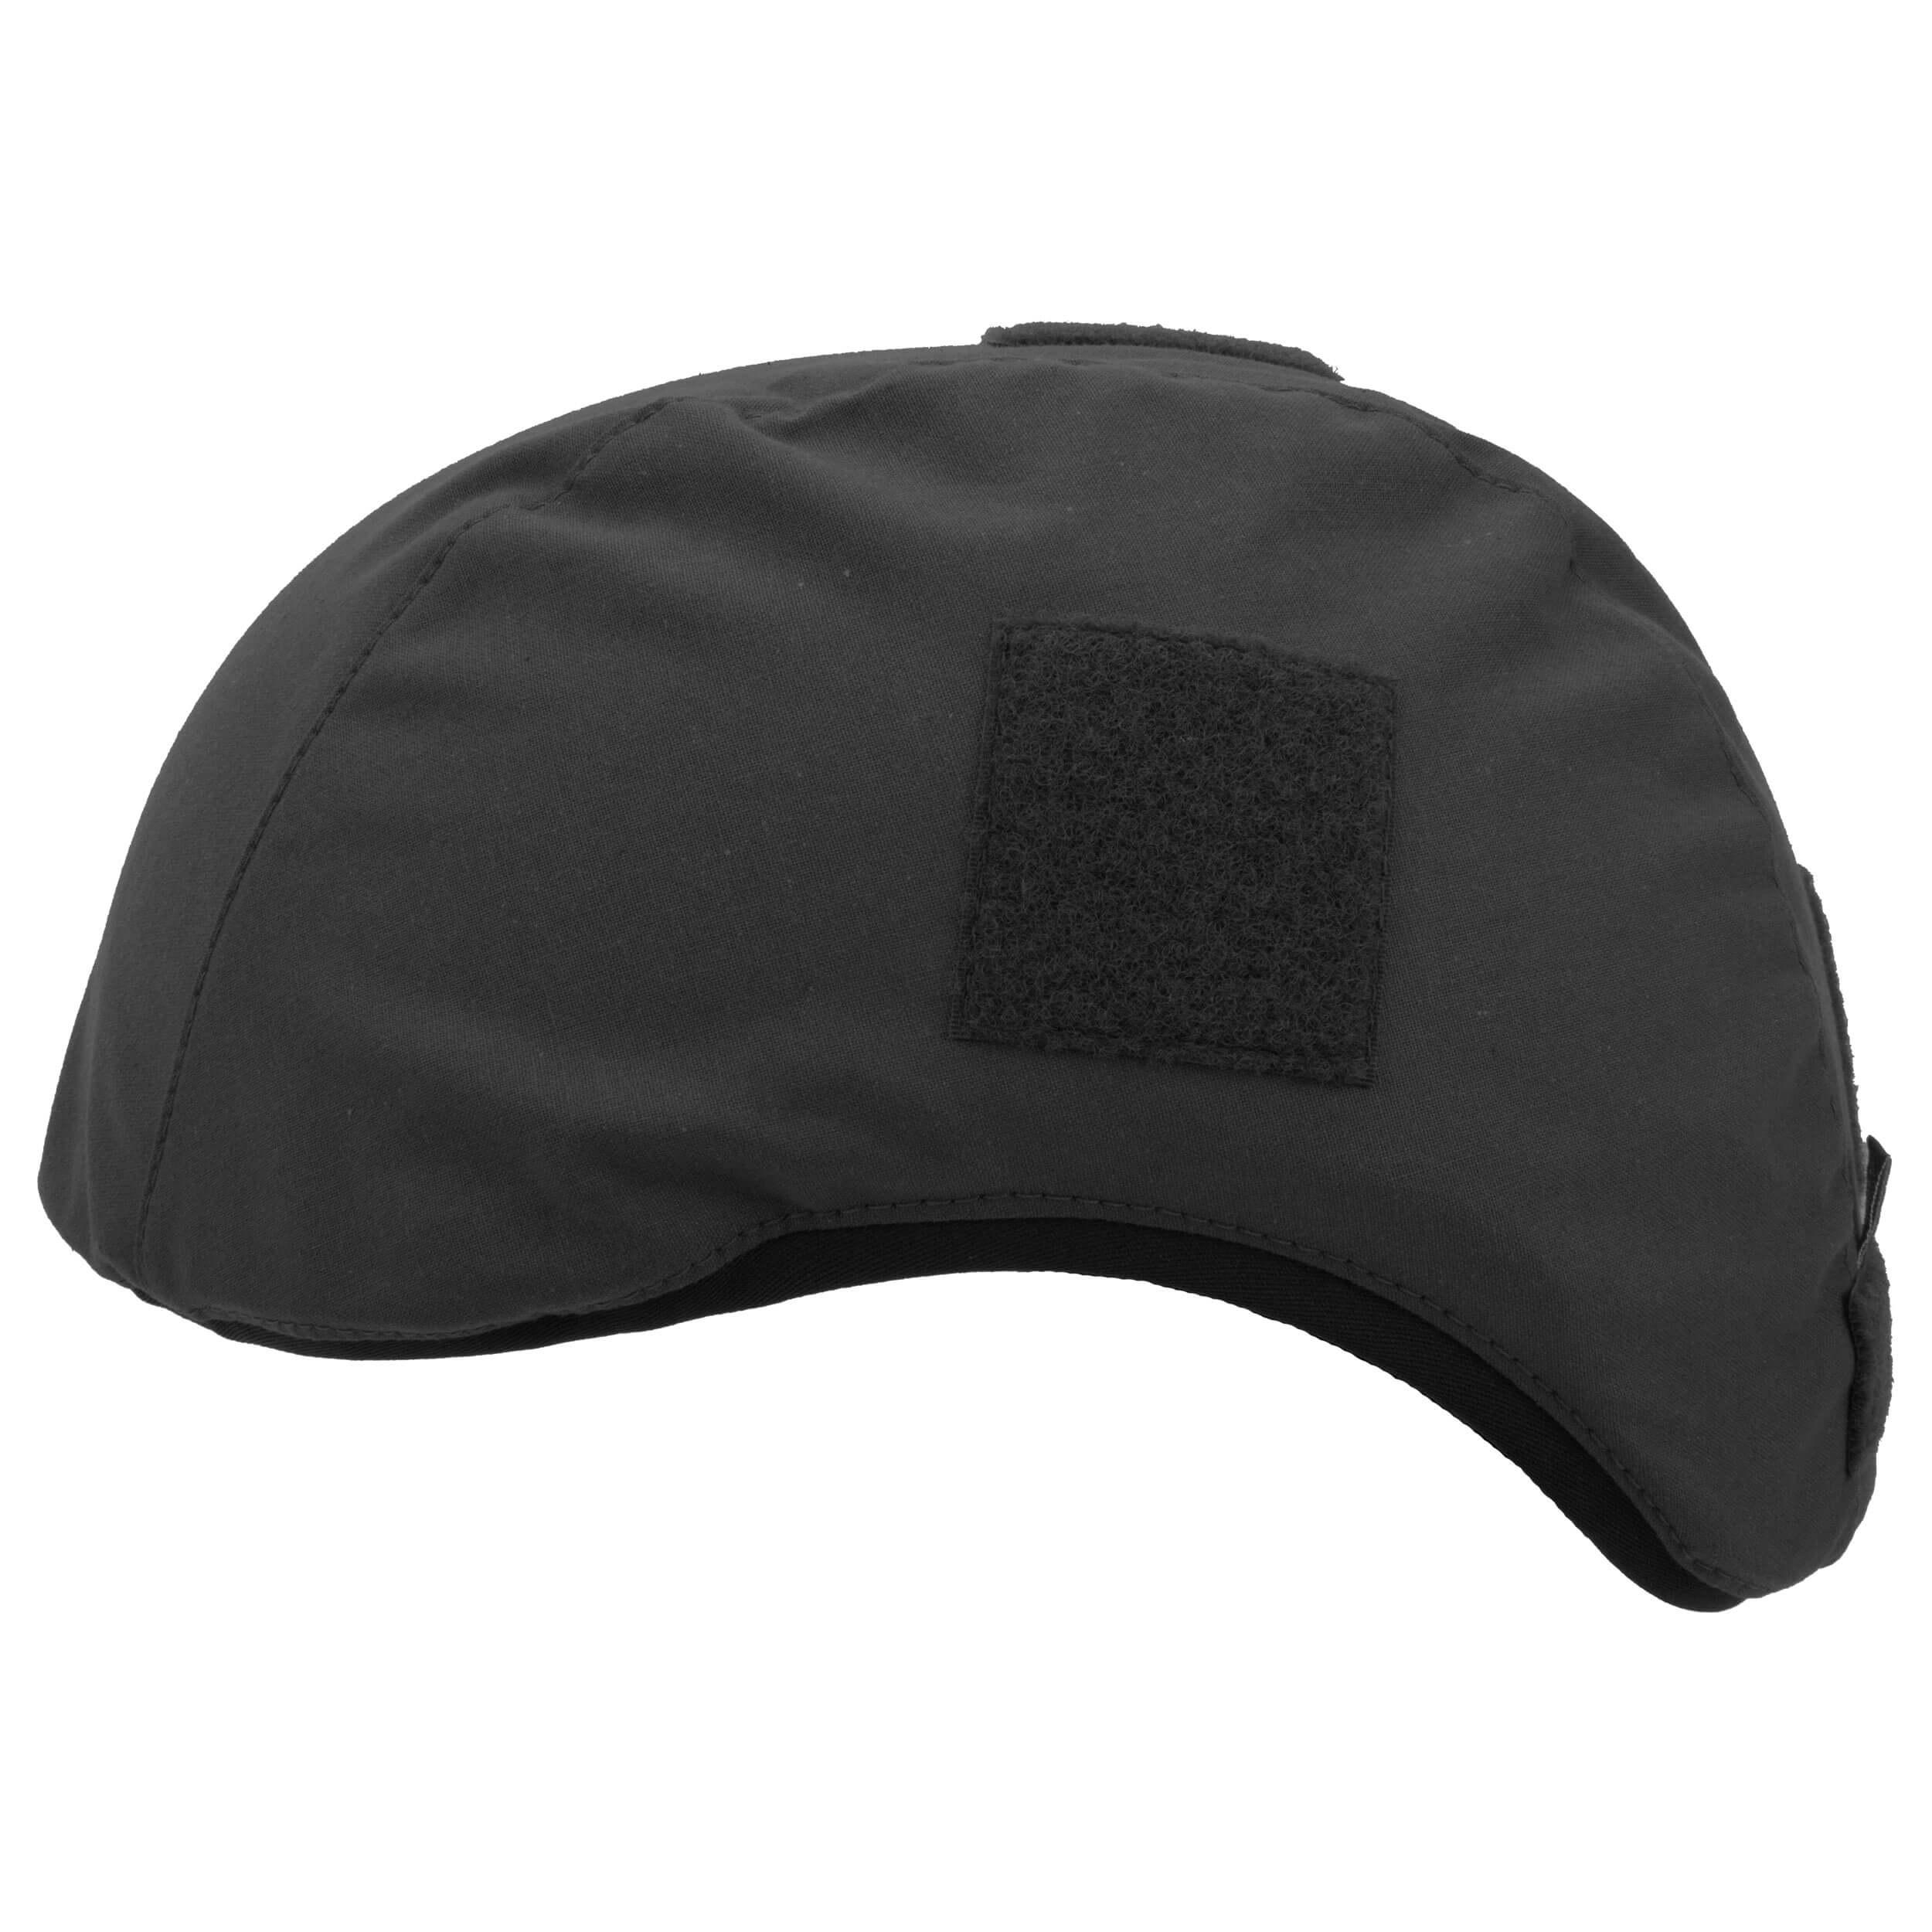 HCS Special Forces Helmbezug schwarz